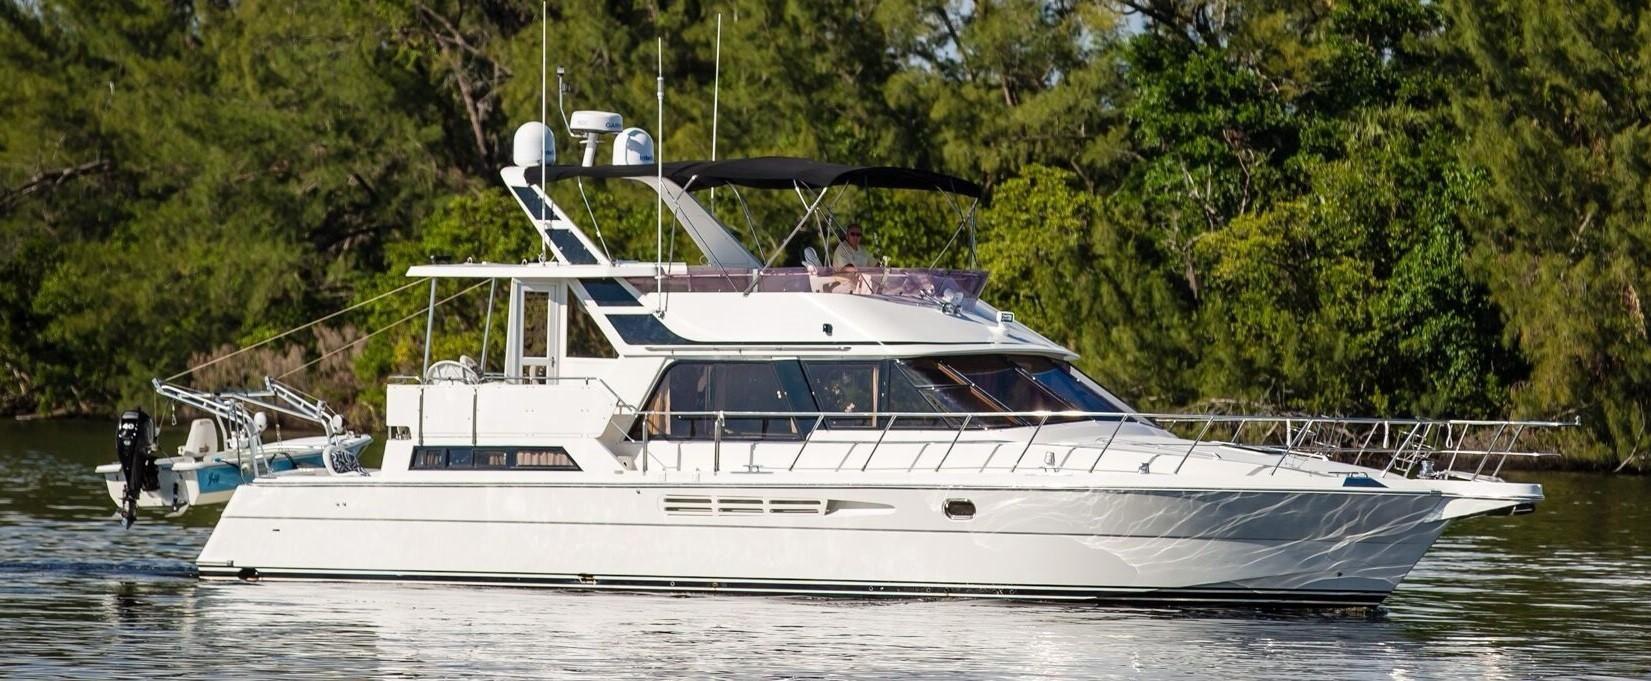 1995 President Motor Yacht / Trawler Motor Boot zum Verkauf - www ...